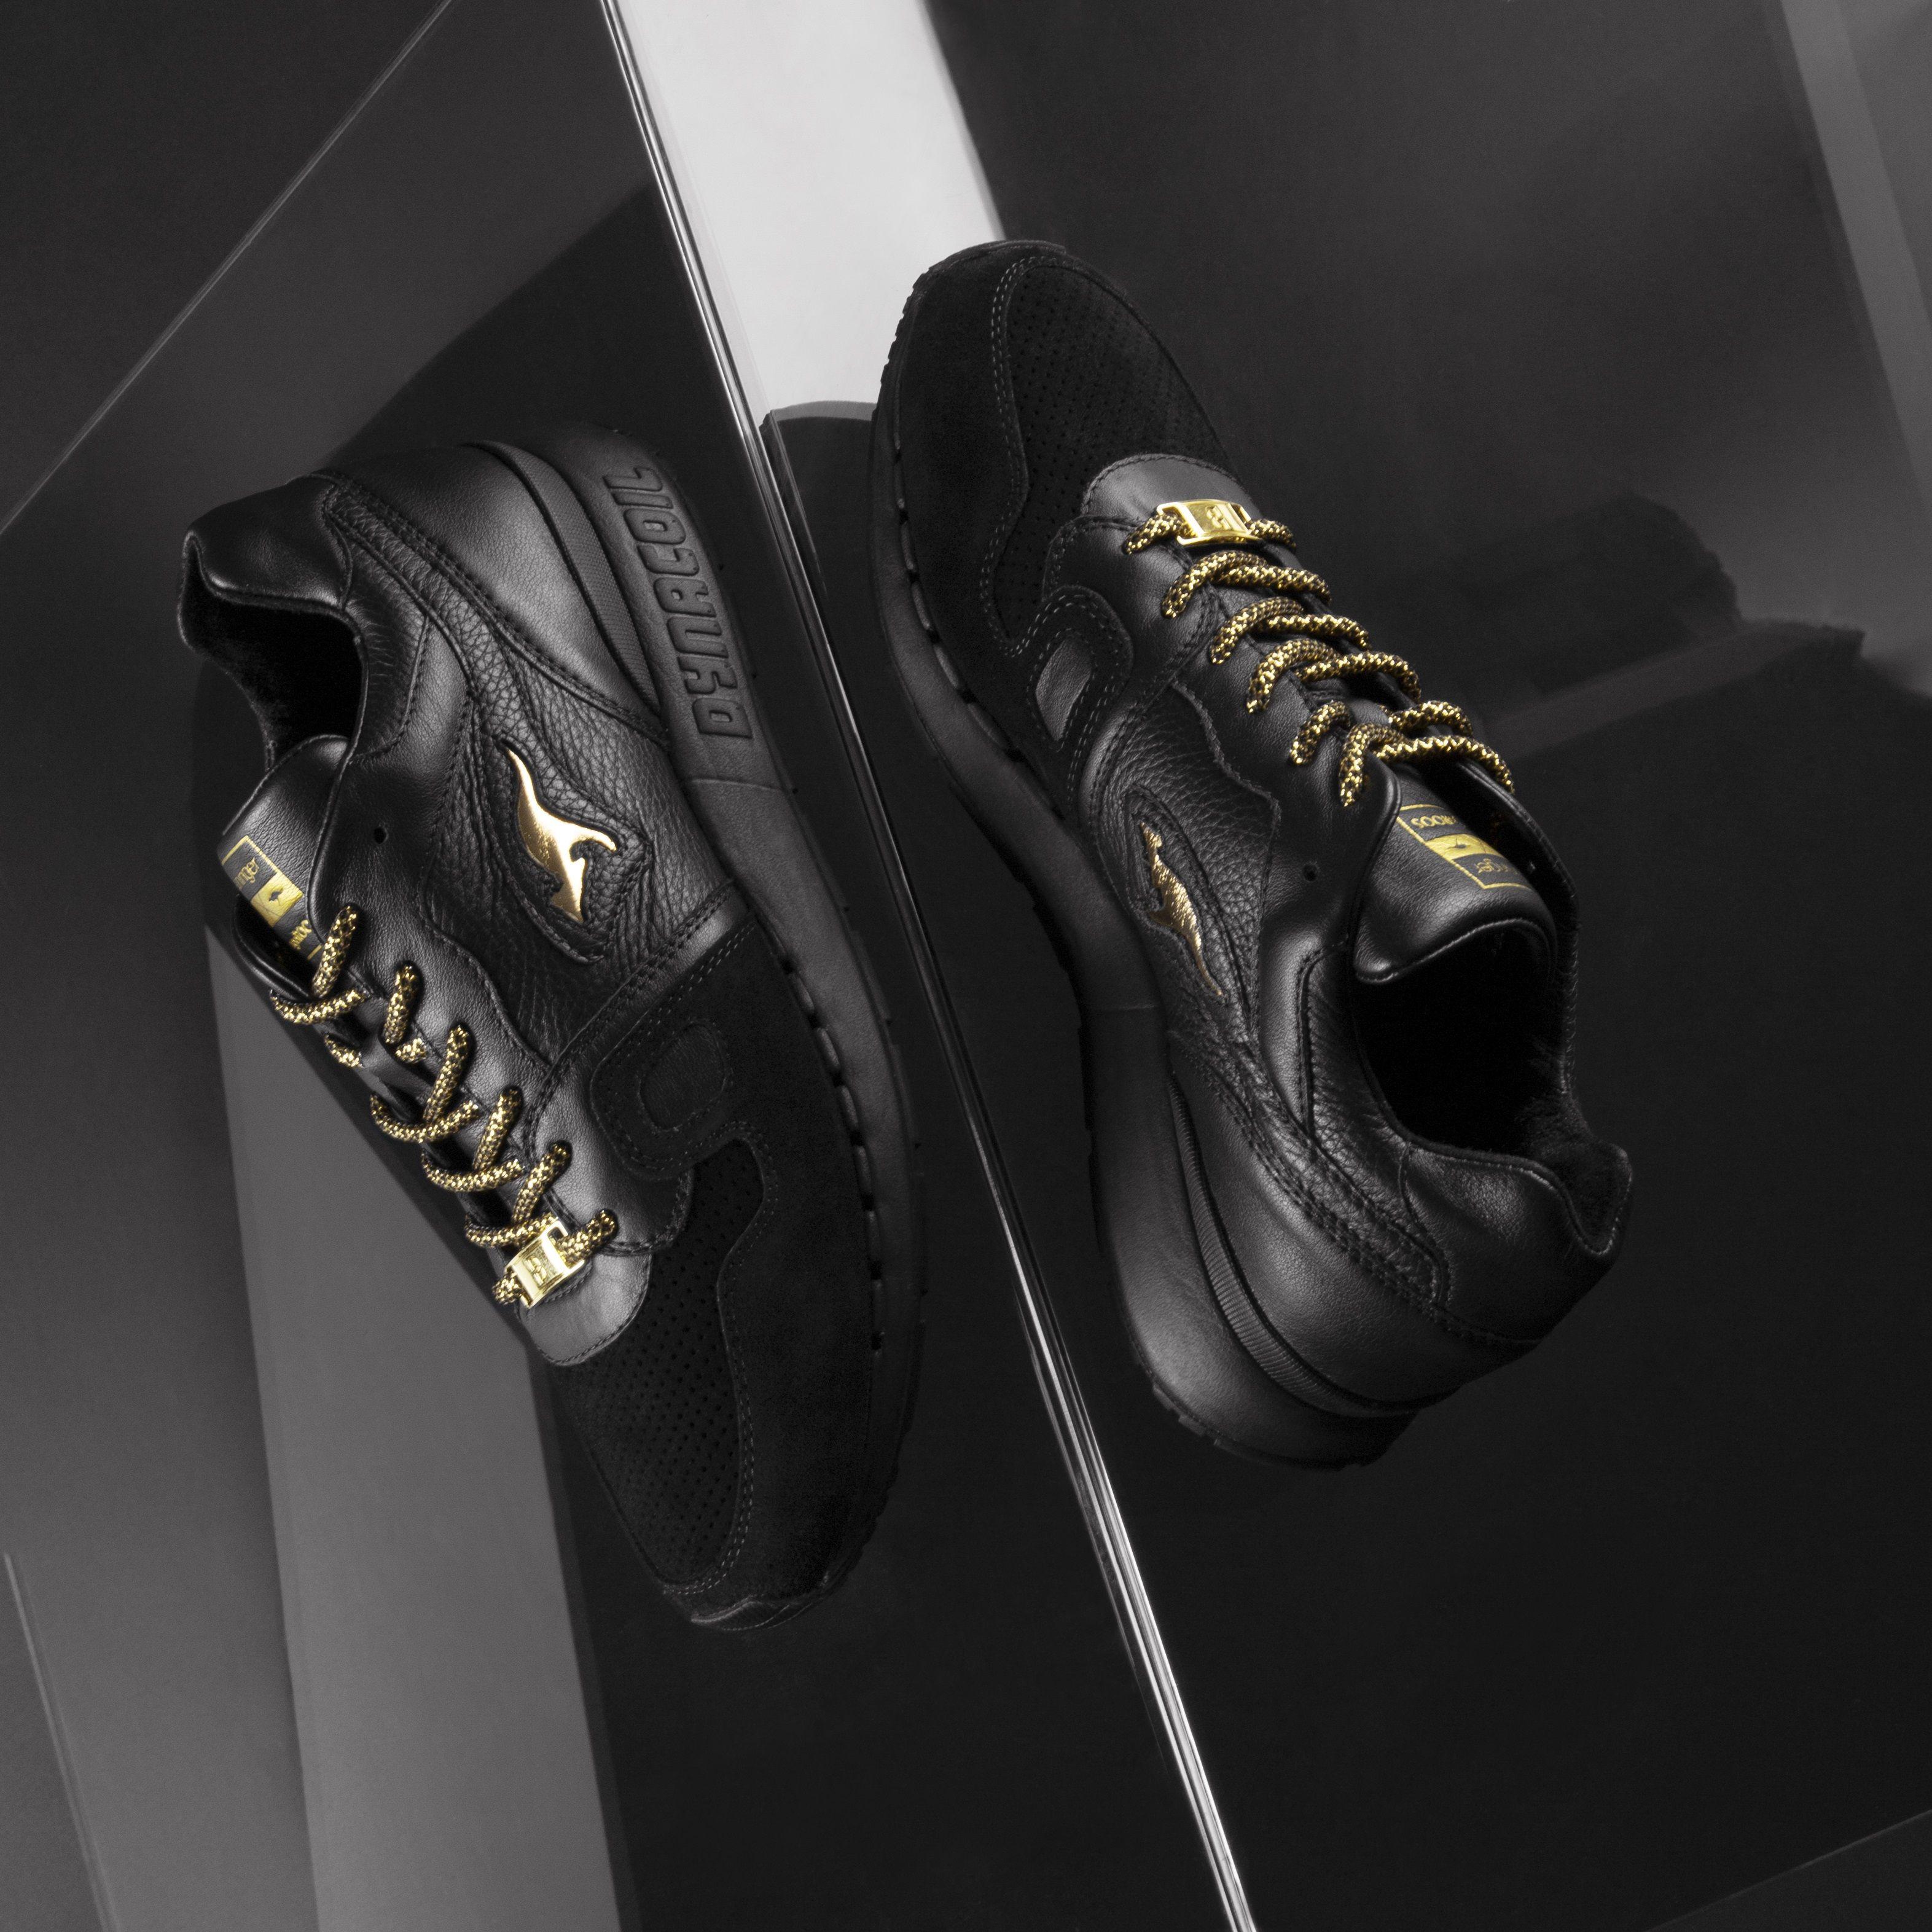 Sneaker Von Kaufen Triple Bei Kangaroos Breuninger Black FJTlKc1